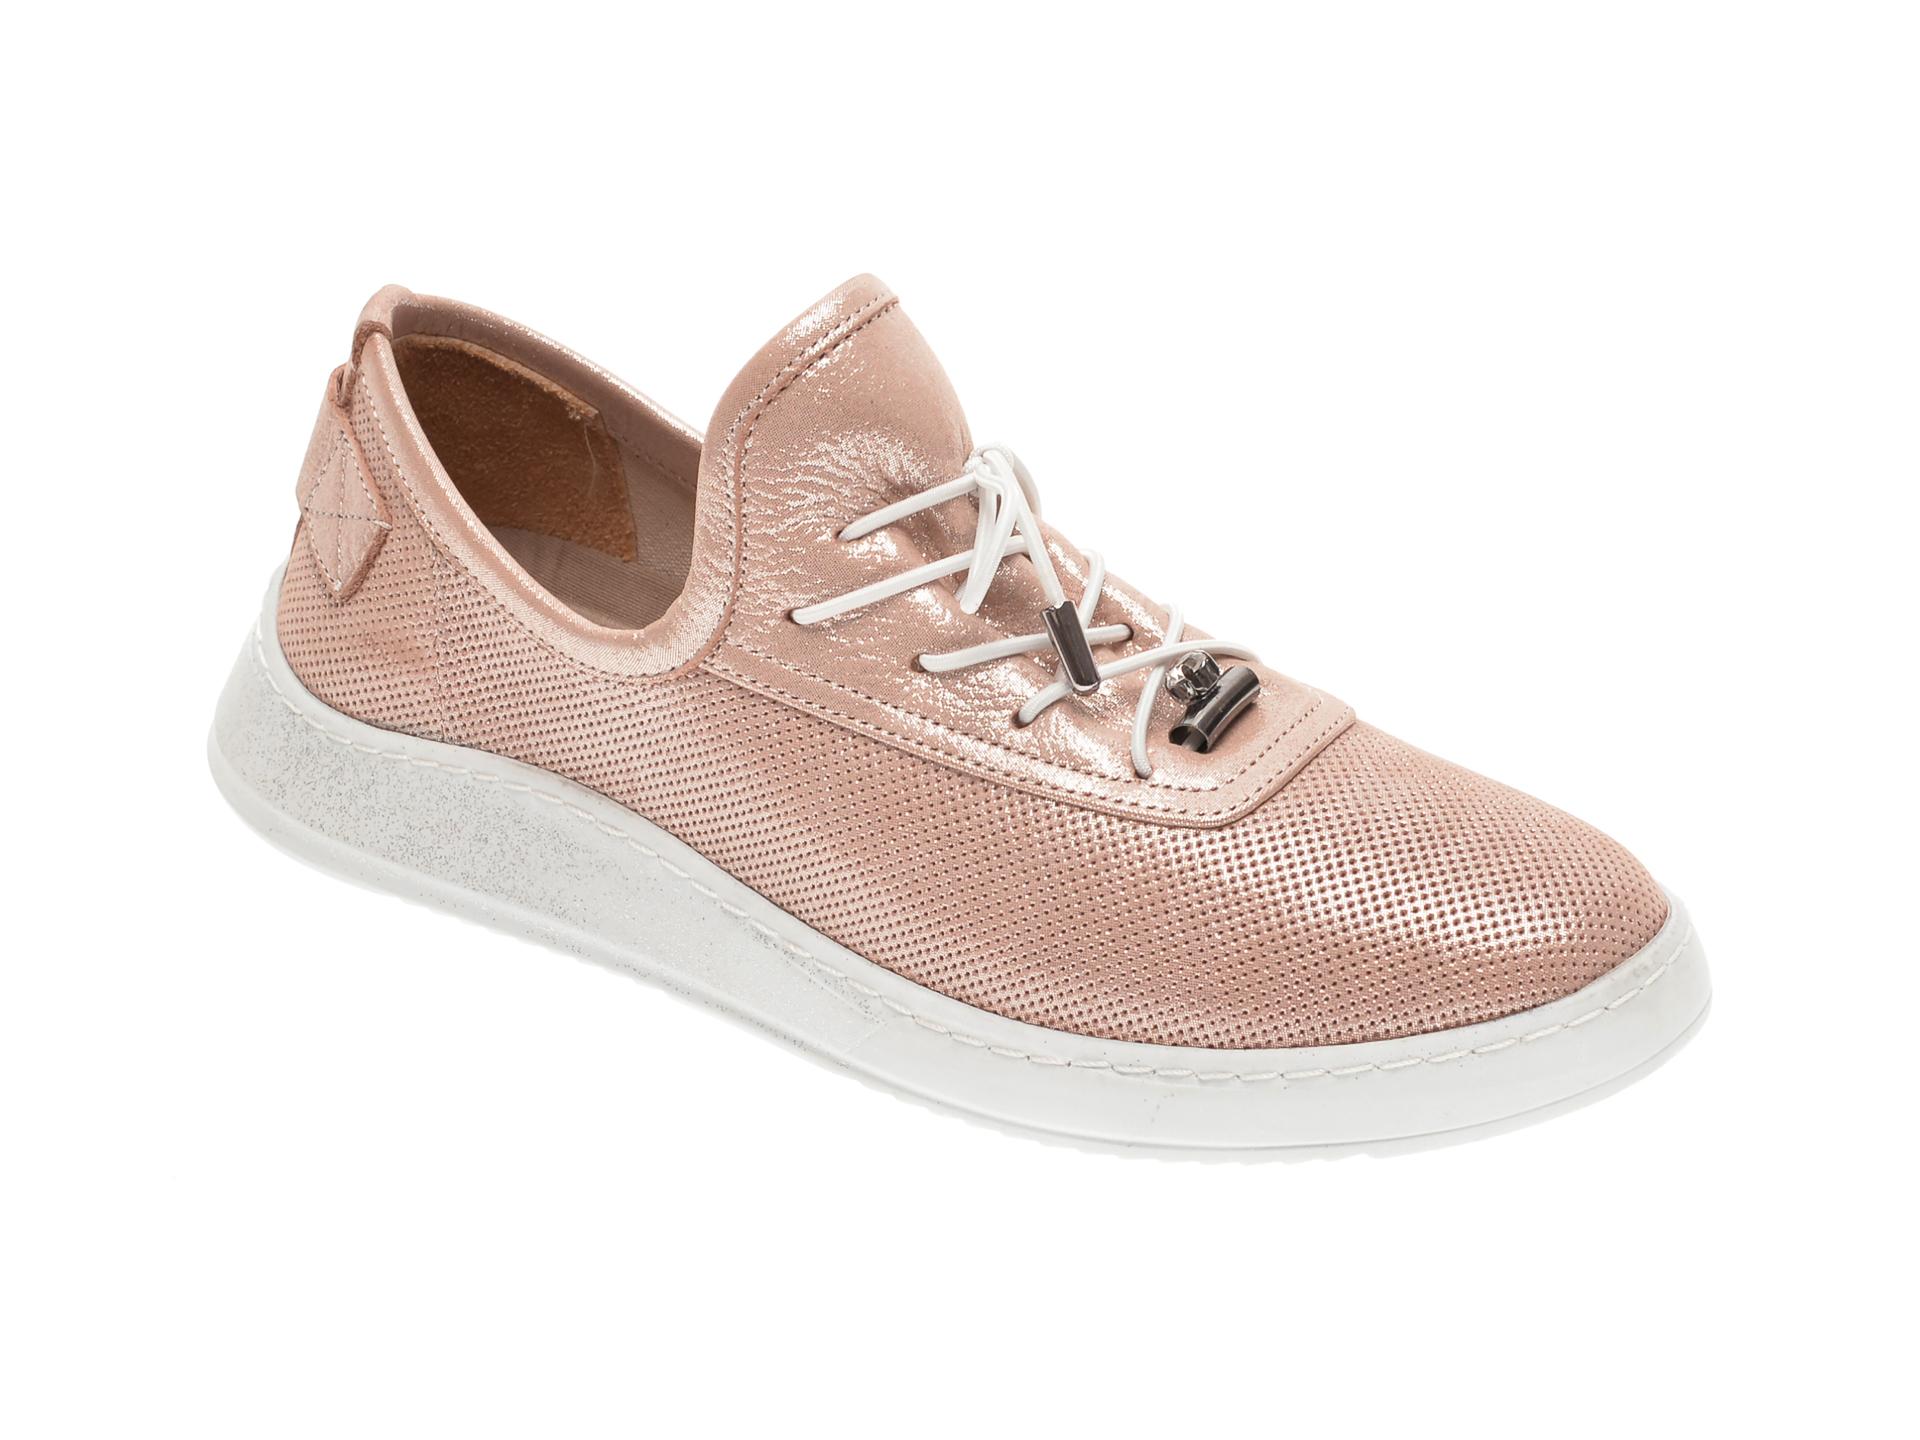 Pantofi BABOOS aurii, 0908, din piele naturala